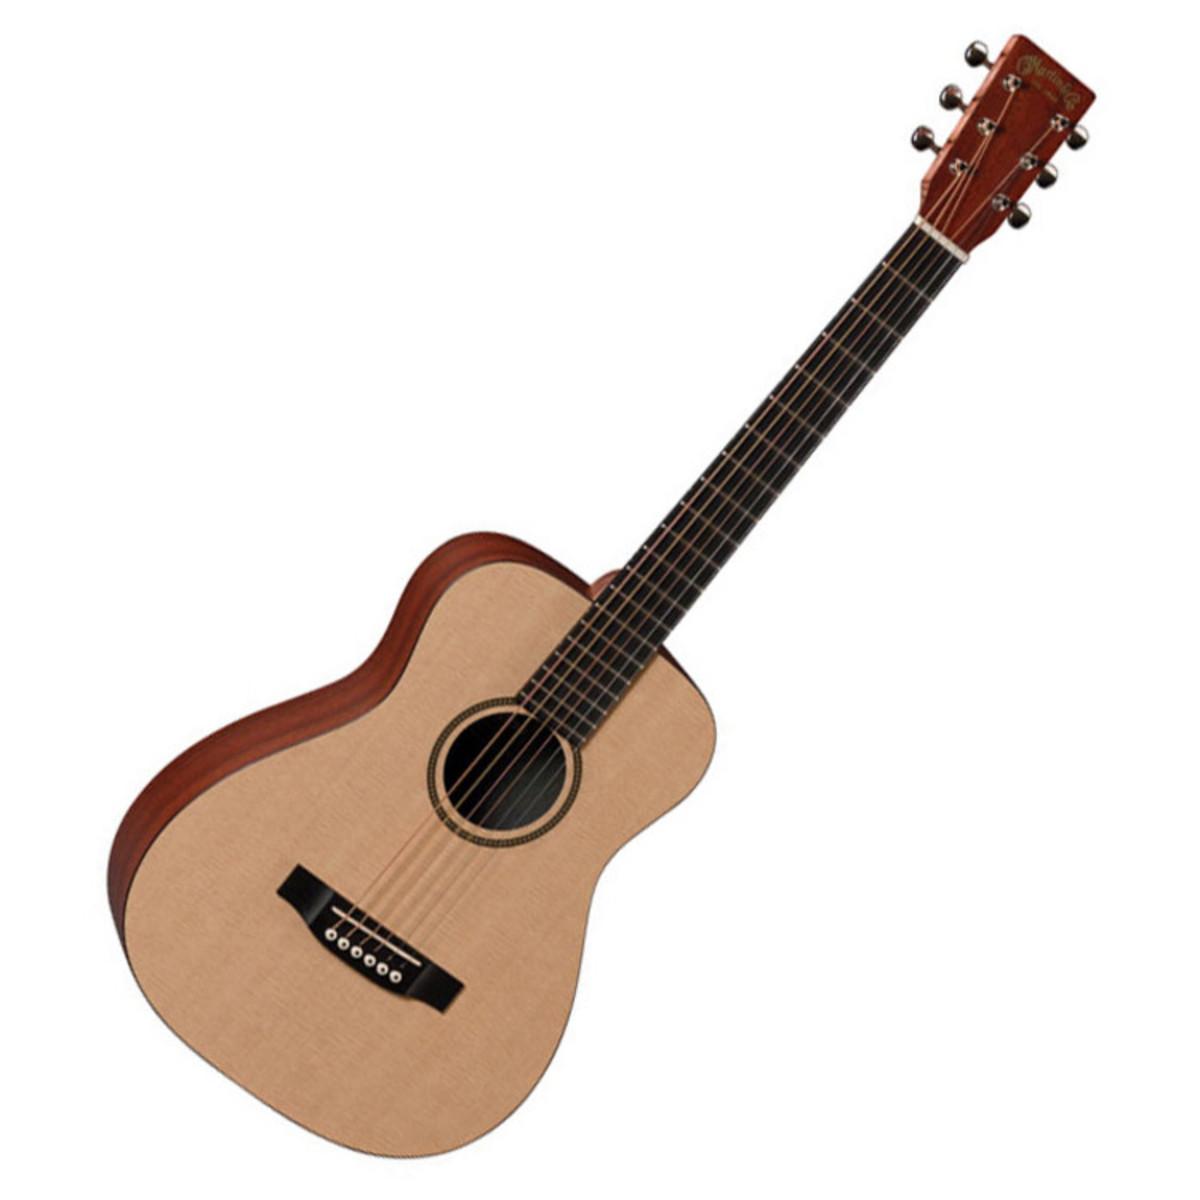 martin lx1 little martin guitar inc gig bag b stock at gear4music. Black Bedroom Furniture Sets. Home Design Ideas